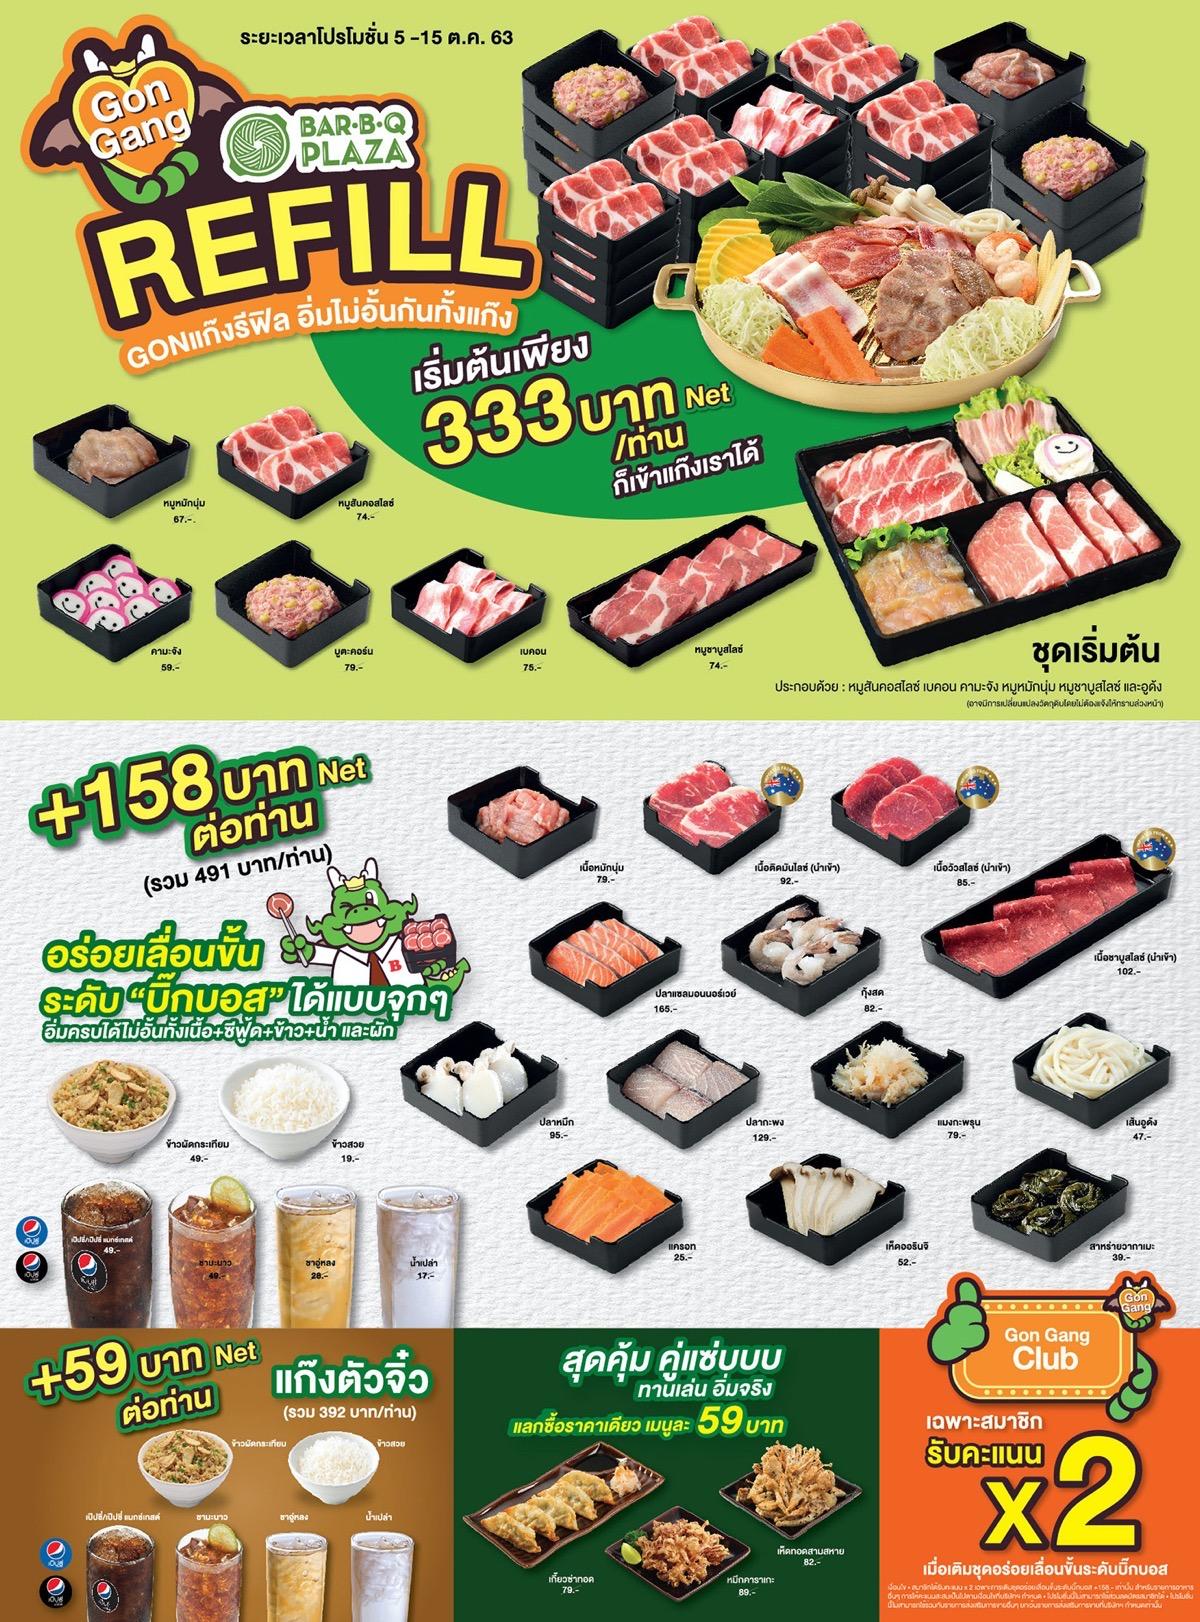 Promotion bbq plaza refill gon gang refill 2020 BBQ Refill1